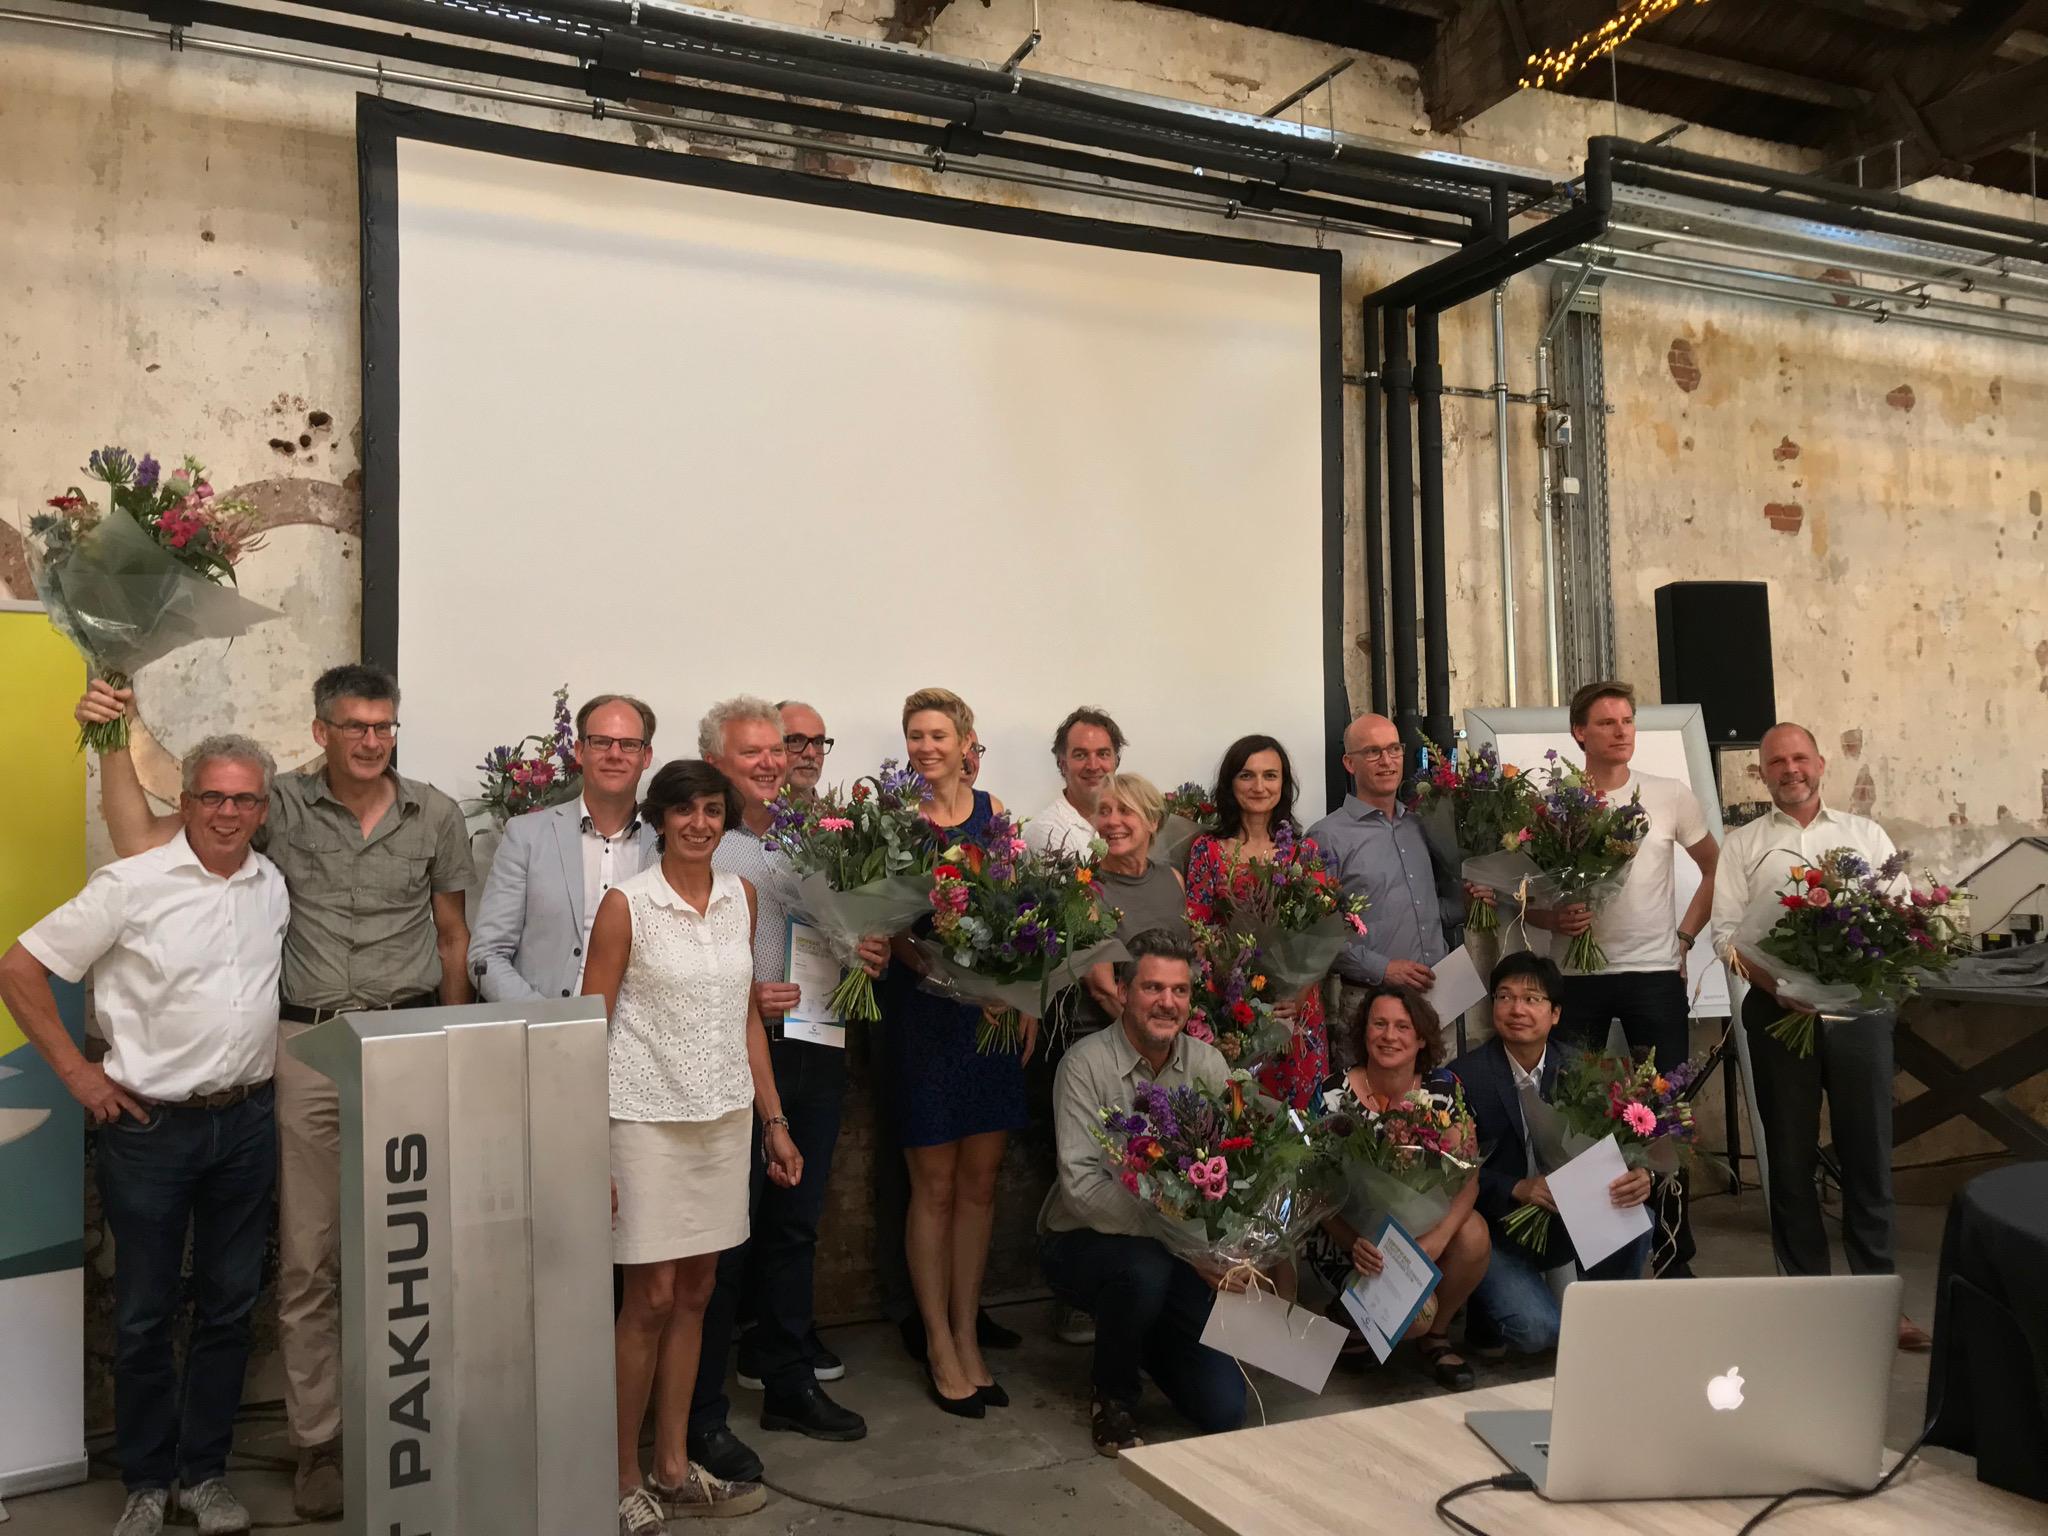 Succesvol Startup Programma Cleantech Center krijgt vervolg